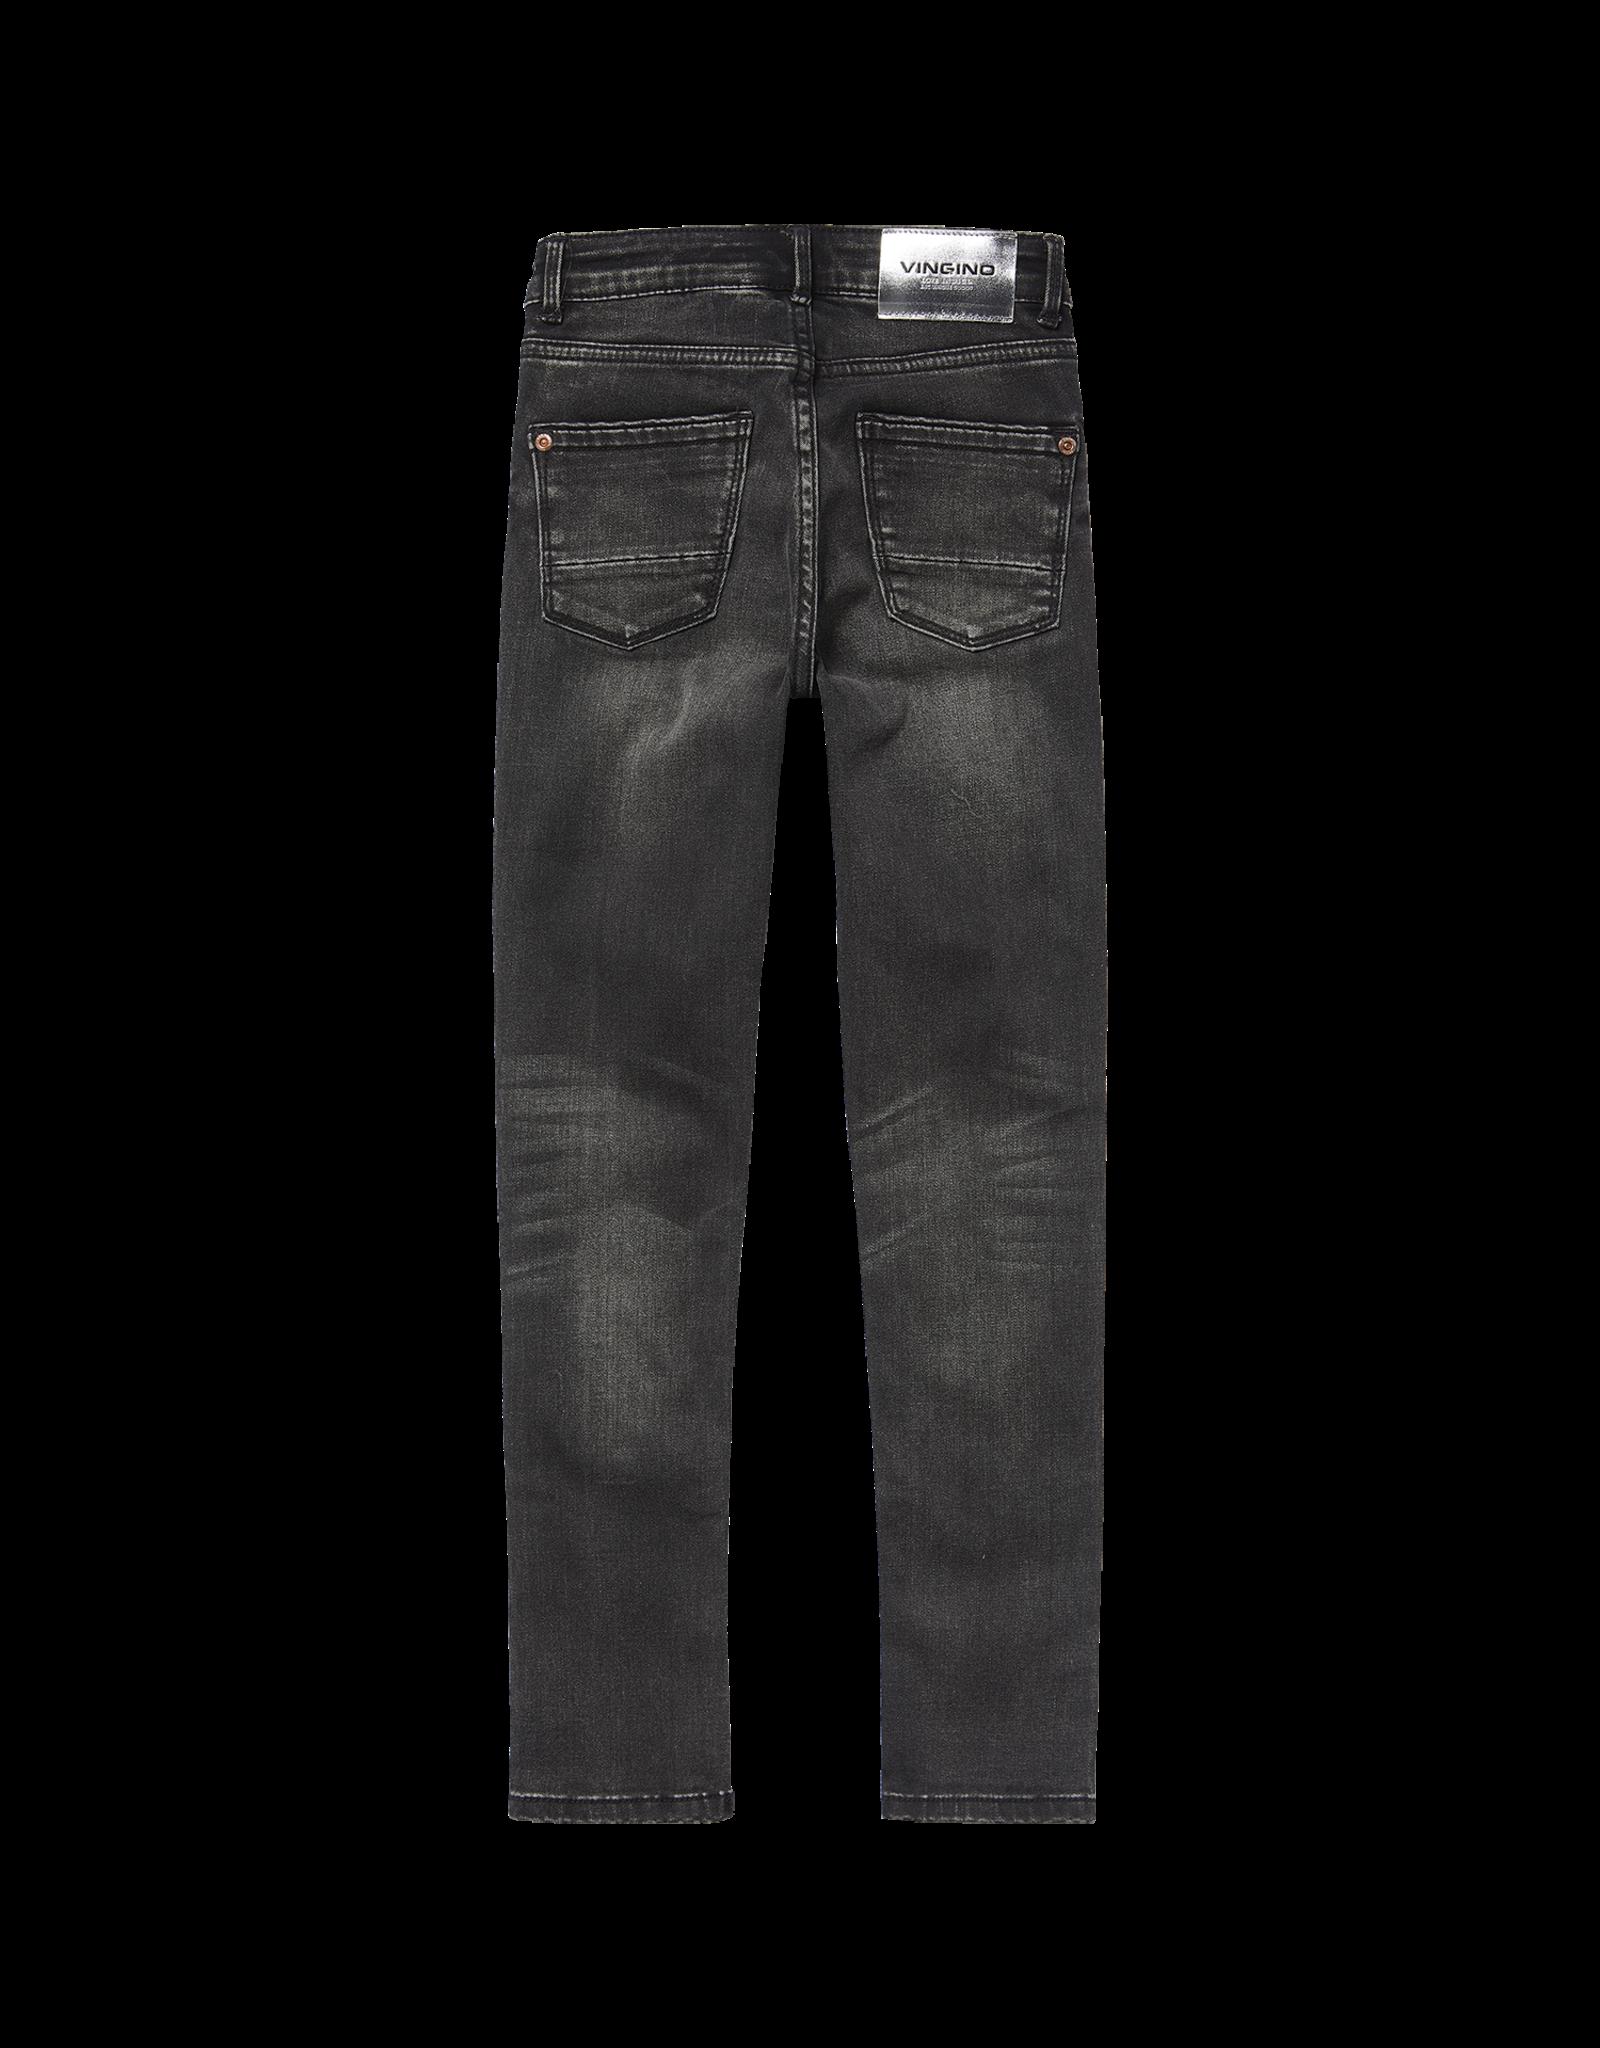 Vingino Babelyn Jeans 913 Dark grey vintage